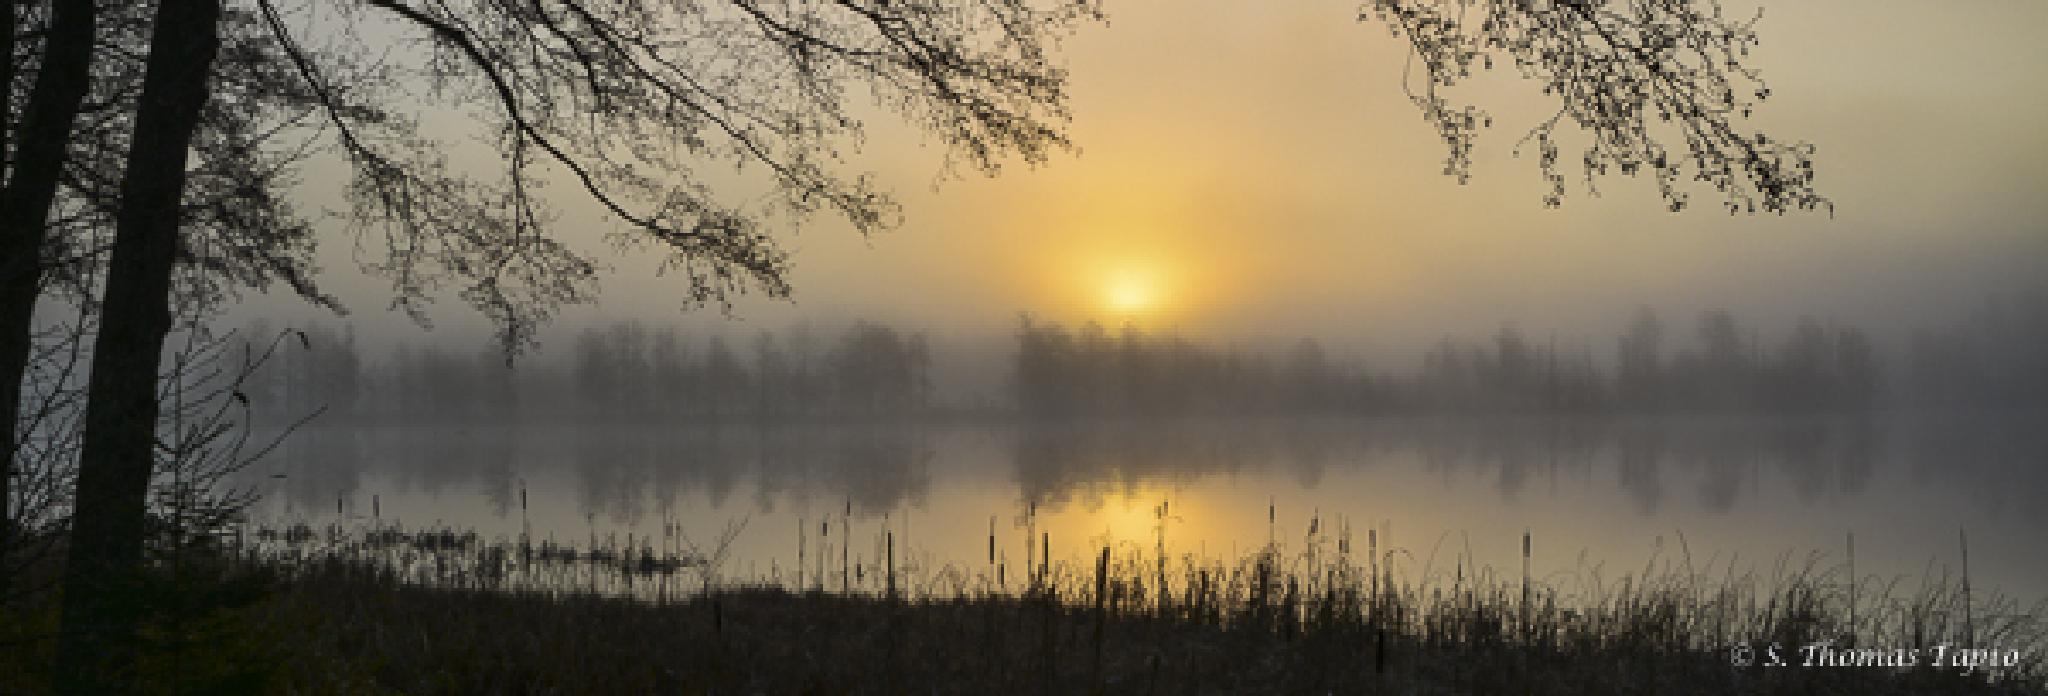 Morning haze over river Helge by Thomas Tapio